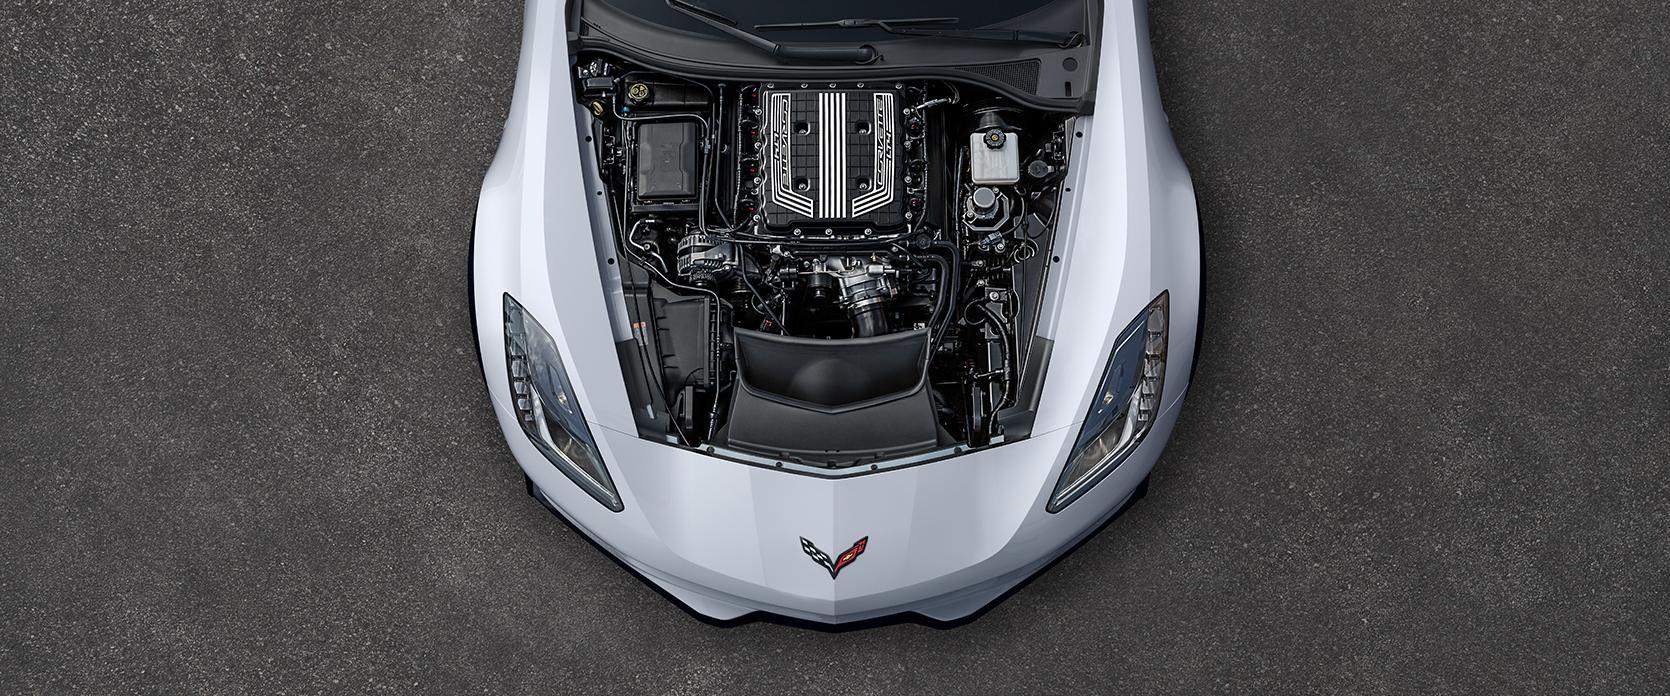 2018 HotWheels 100 Years Chevrolet Trucks🚛🚙 Complete set